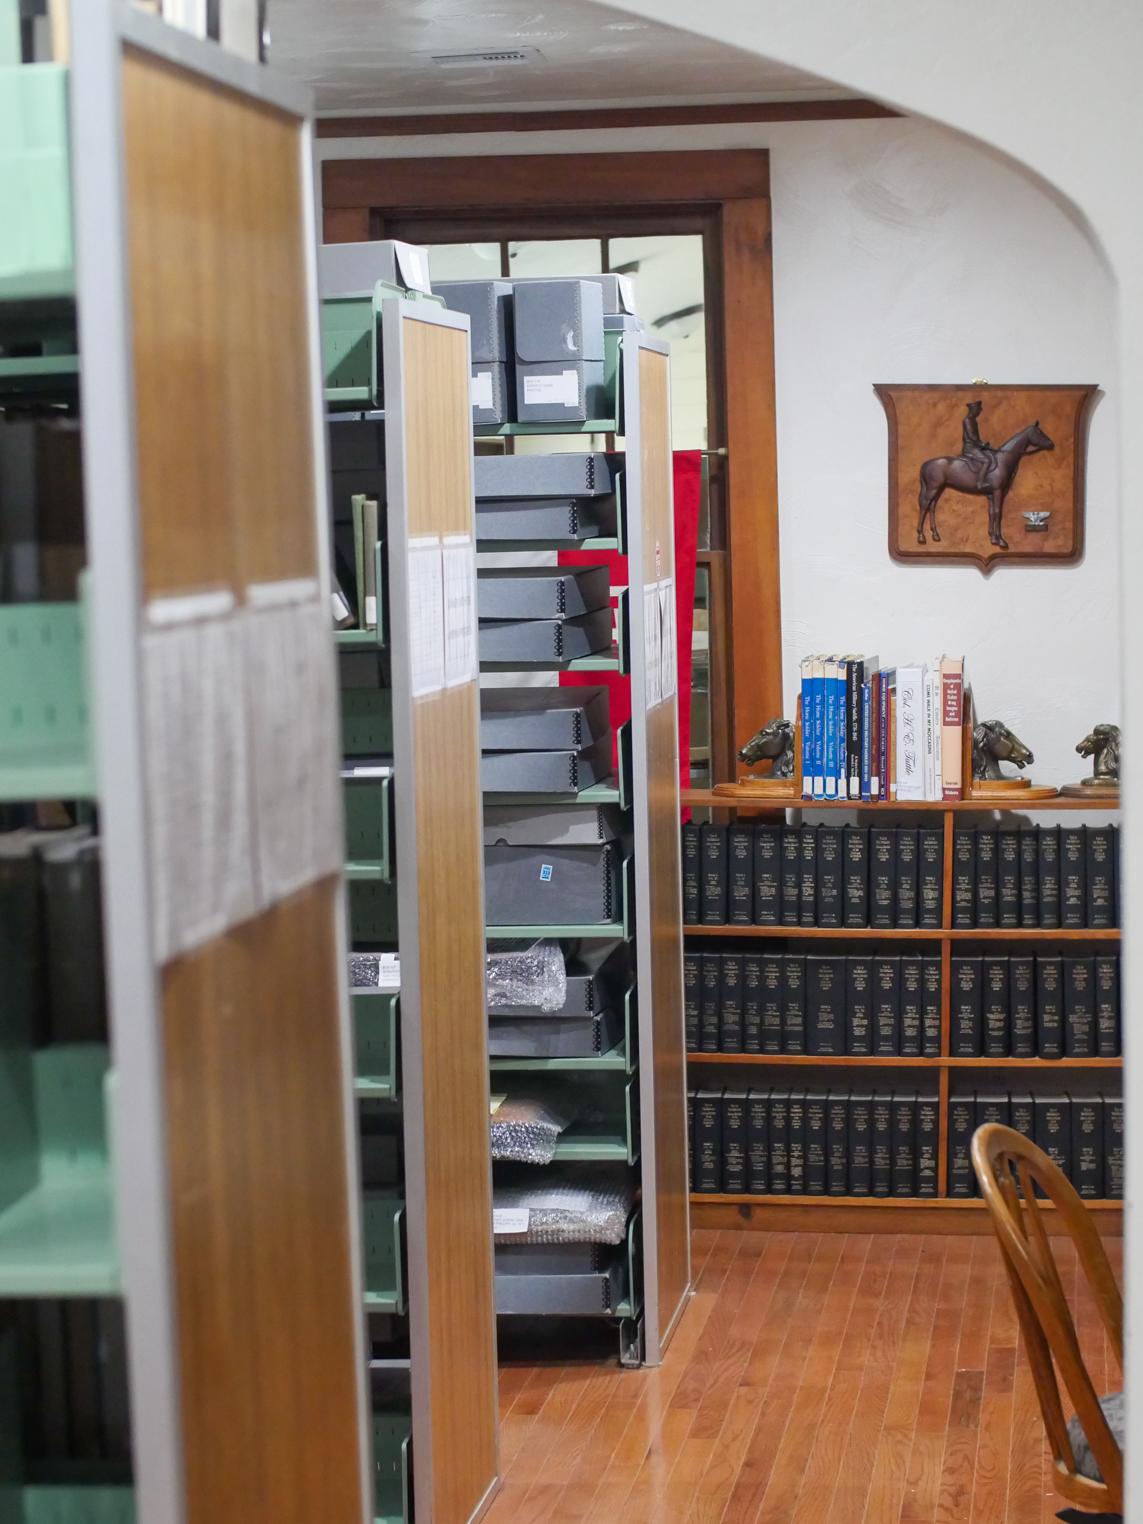 u.s cavalry museum library